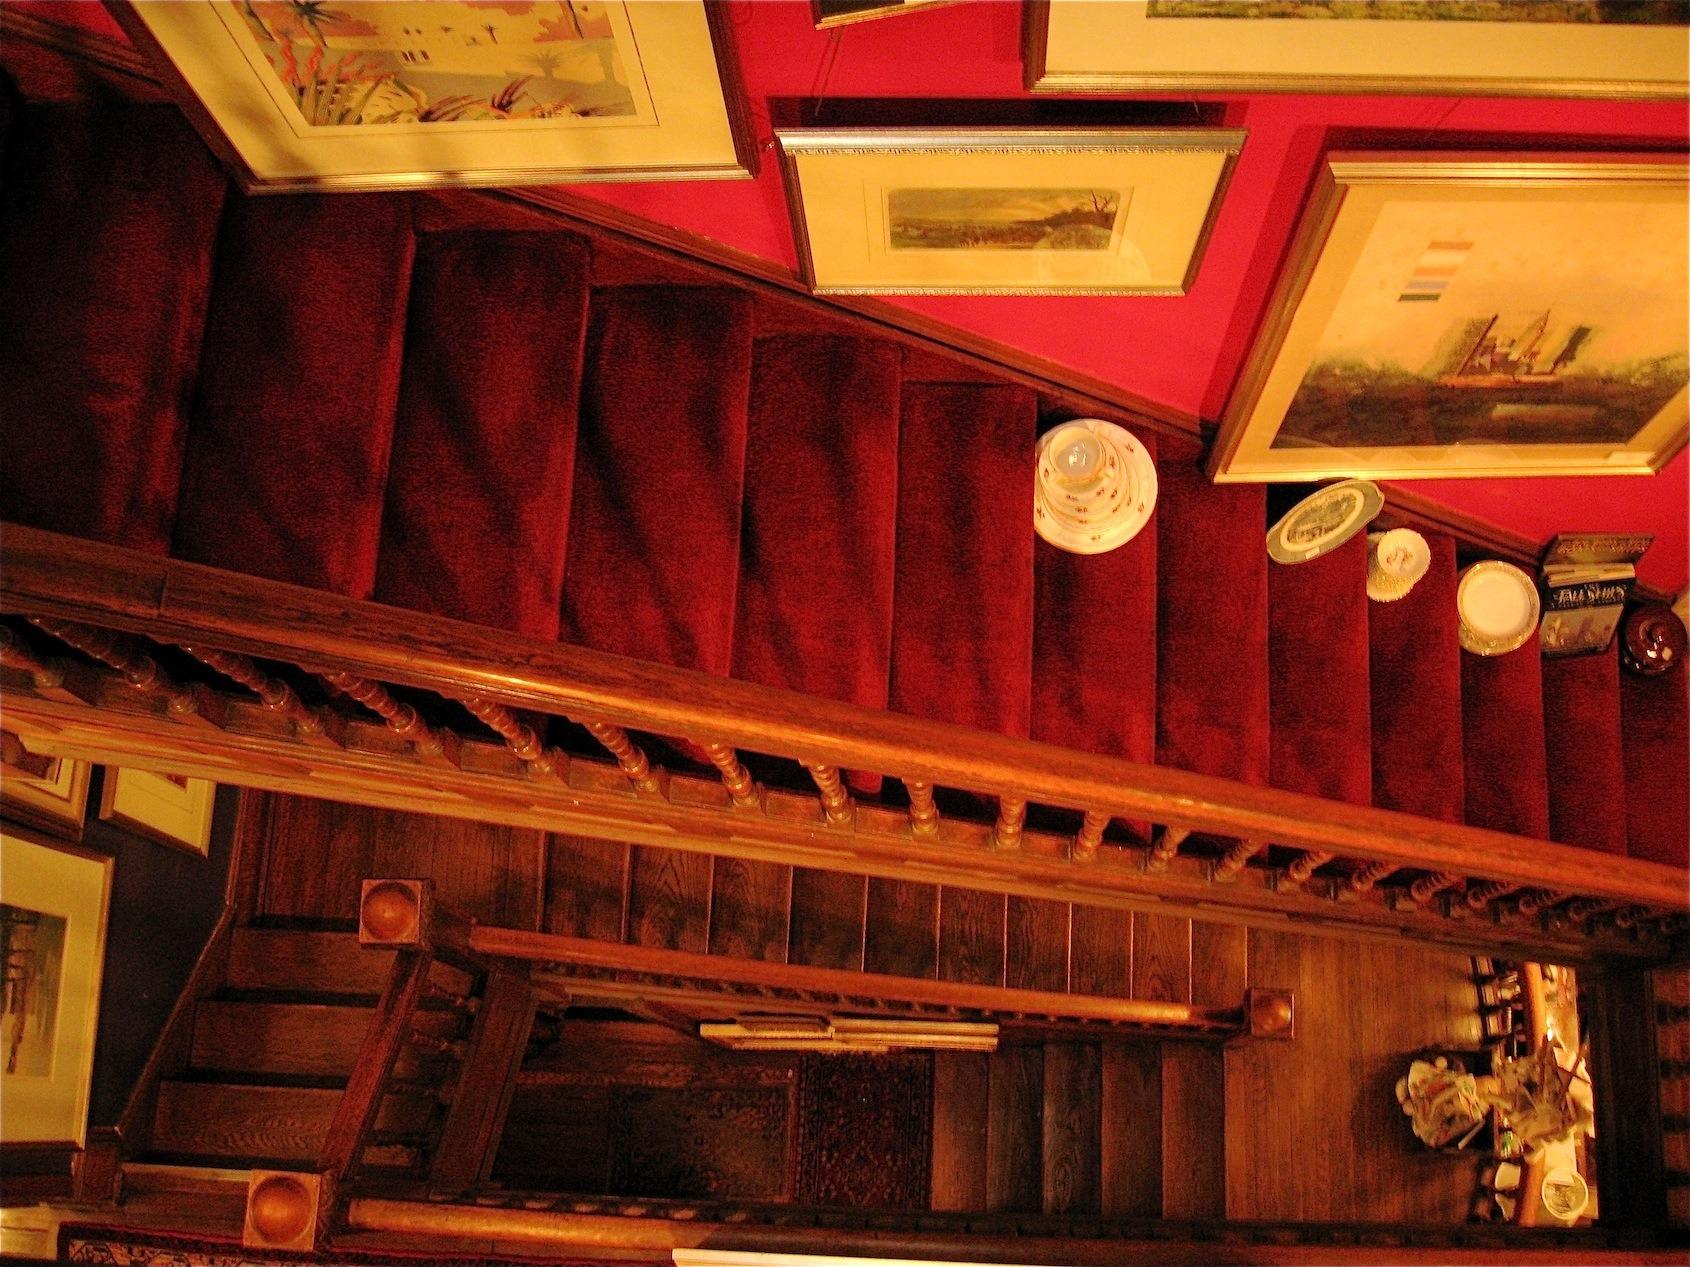 Tour Dupont's Mansion on O Street